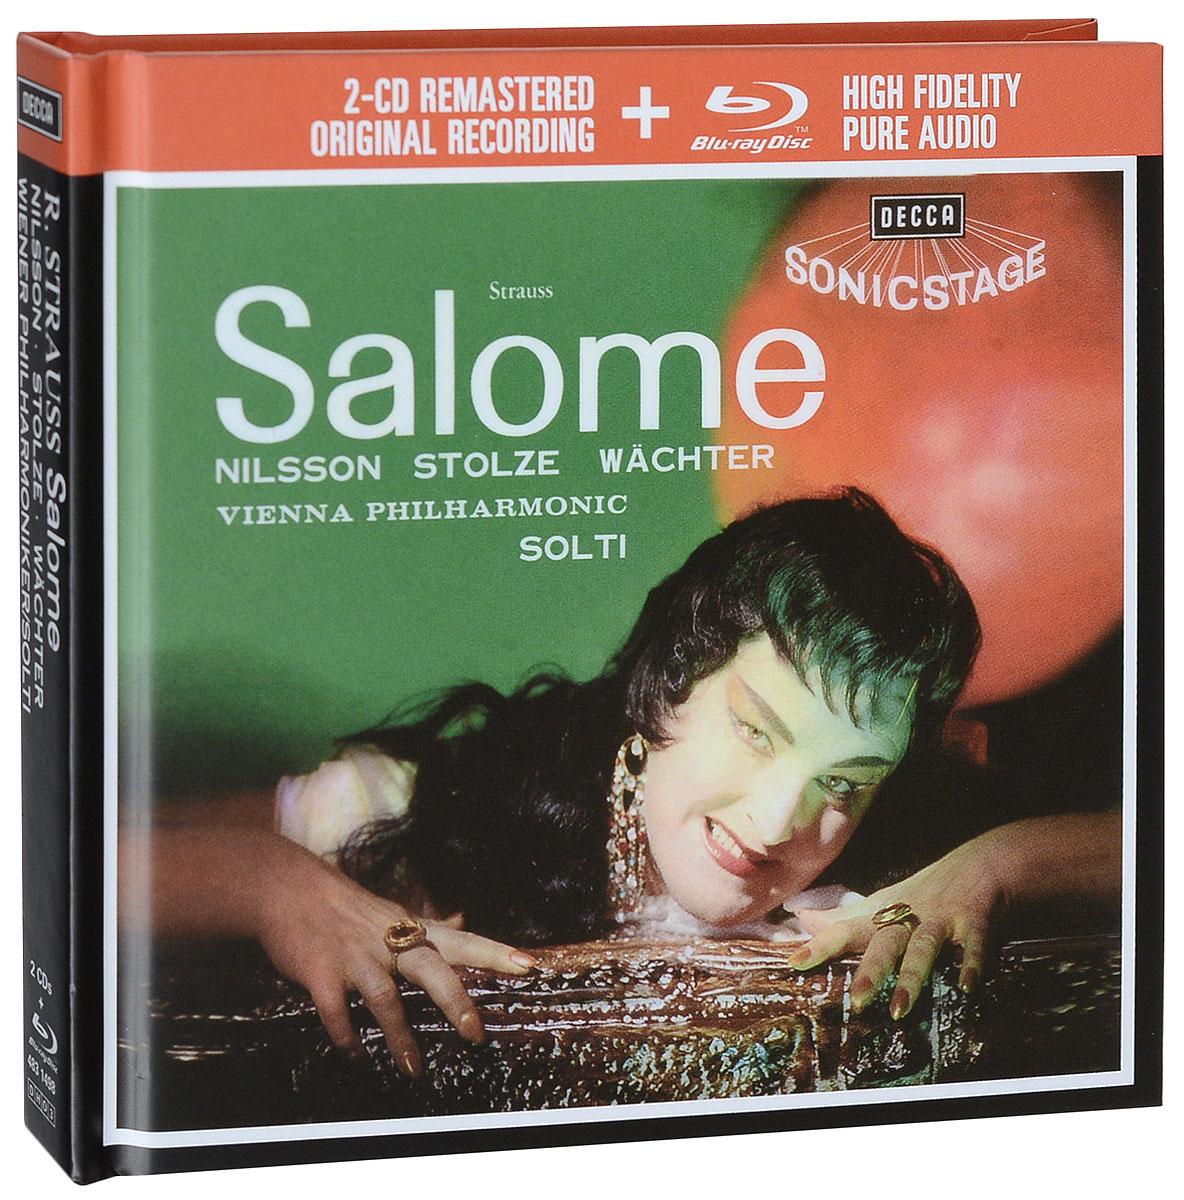 Бирджит Нильссон,Георг Шолти Birgit Nilsson. Sir Georg Solti. Salome (2 CD + Blu-Ray) бирджит нильссон birgit nilsson la nilsson 79 cd 2 dvd